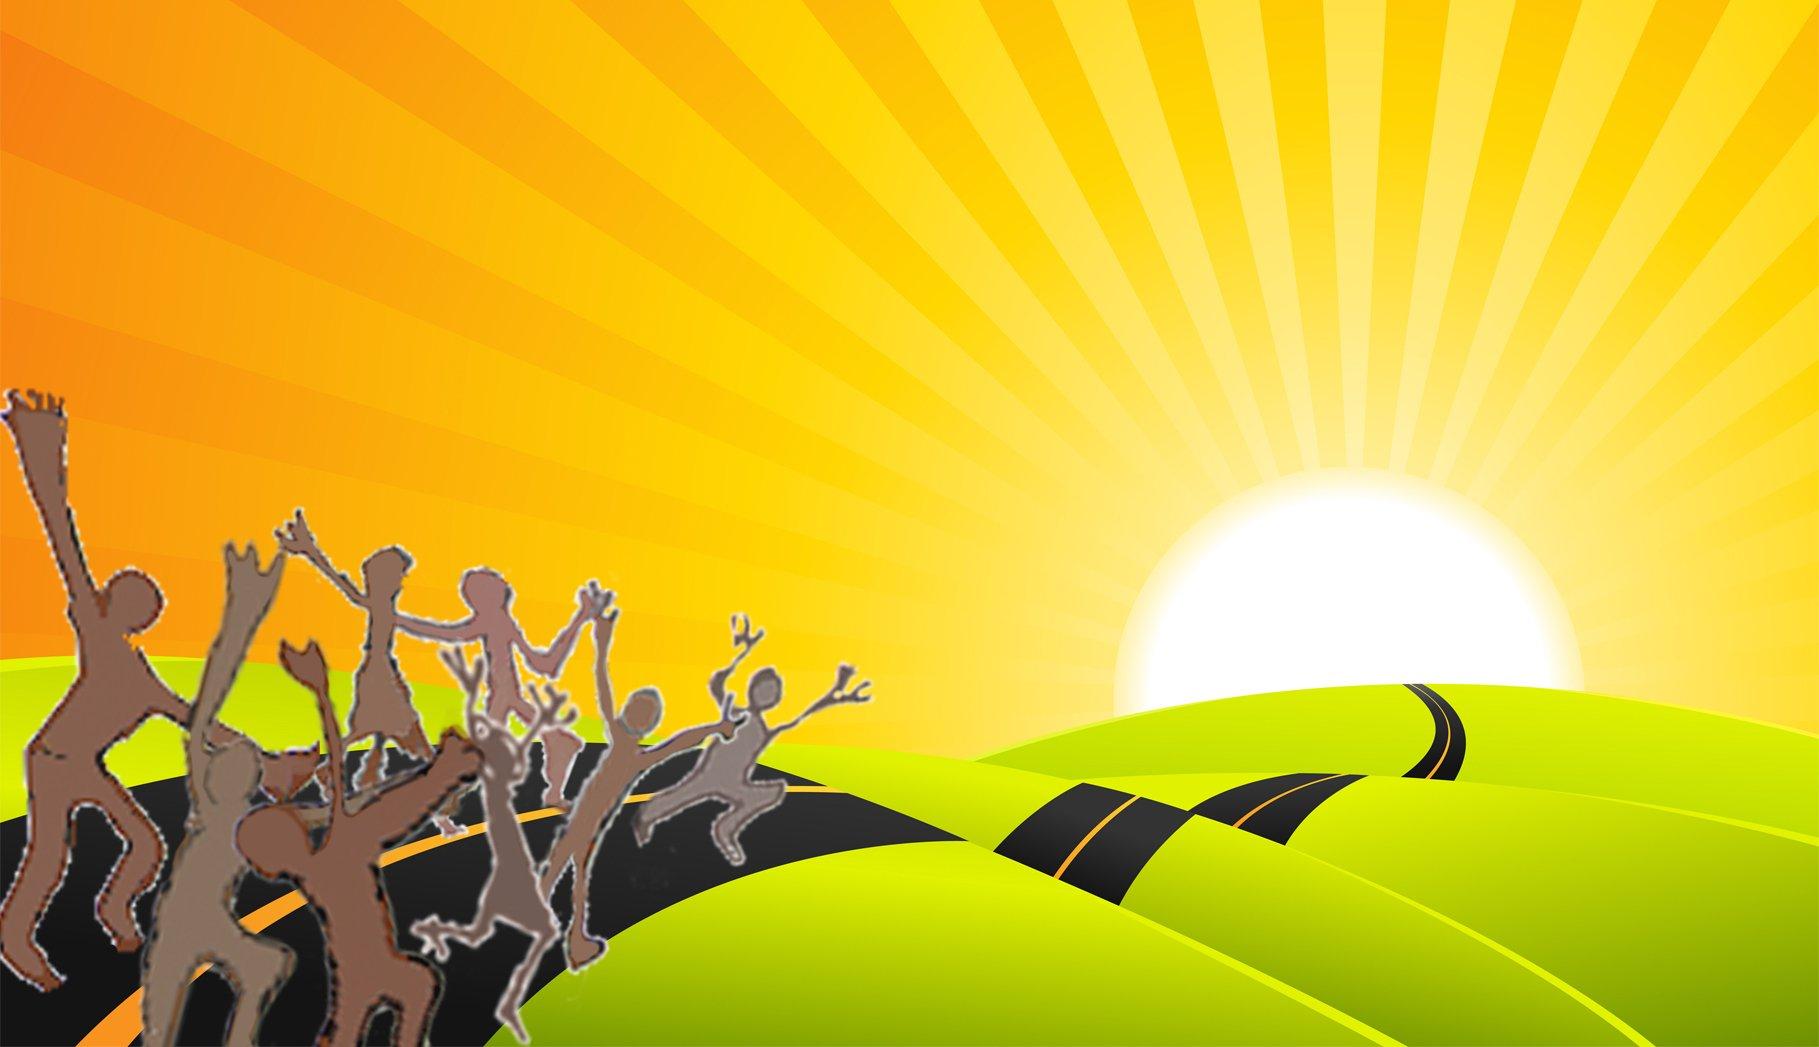 The Sunshine Highway to Freedom cartoon